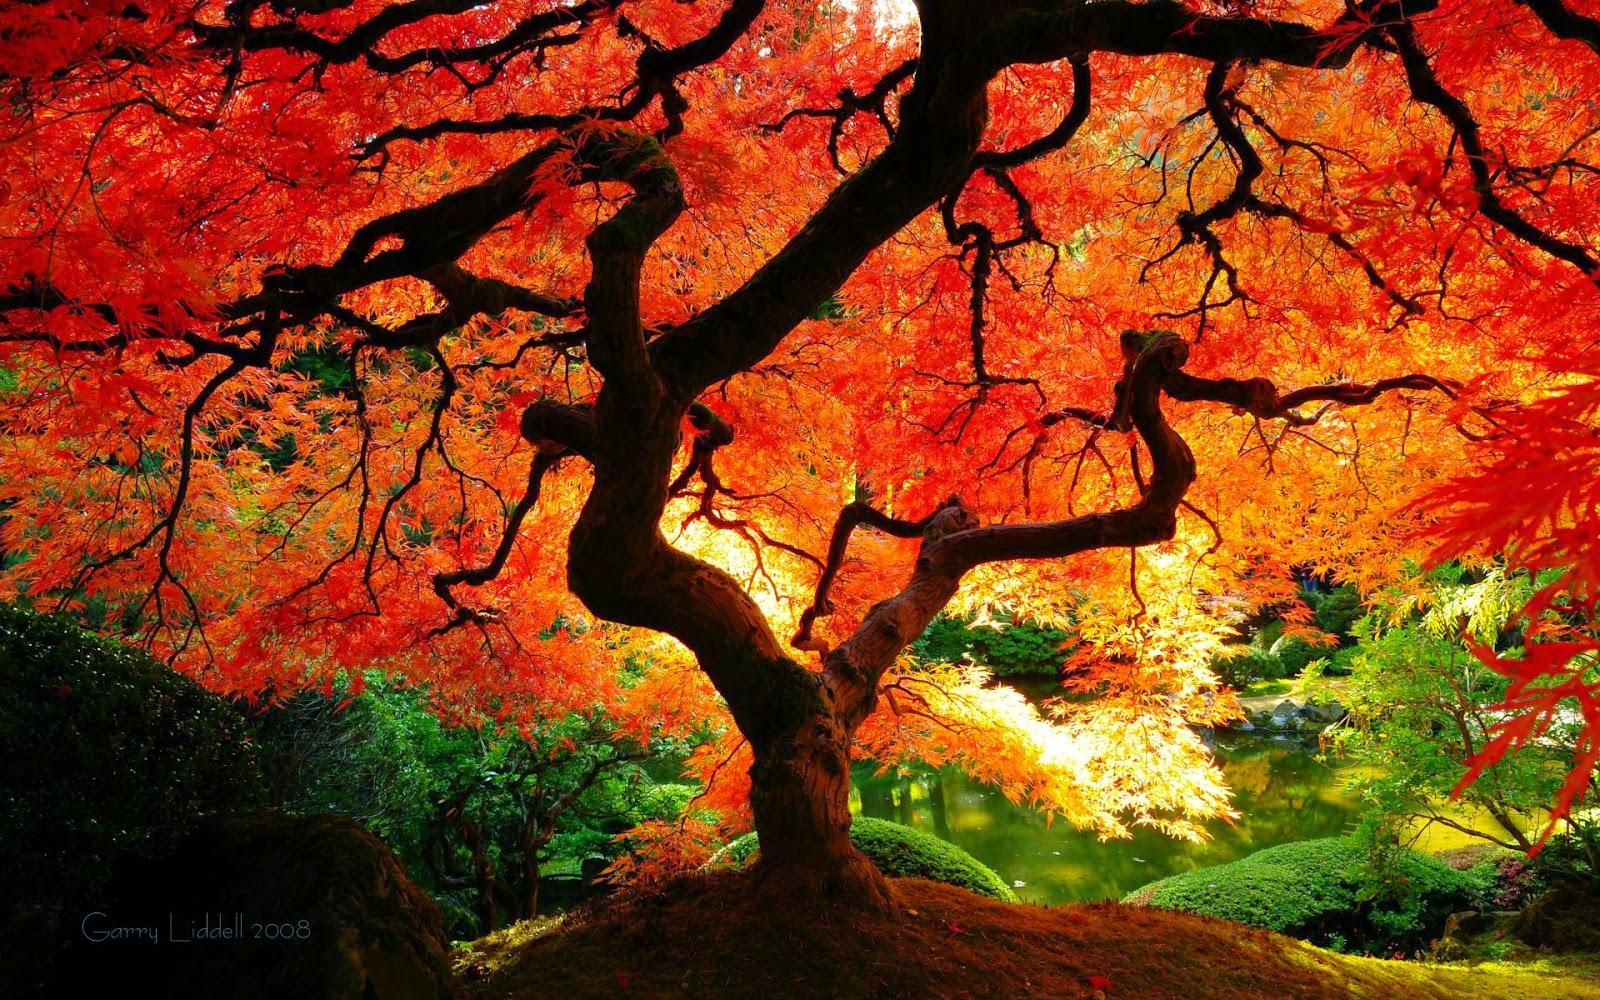 Autumn Wallpaper 1080p